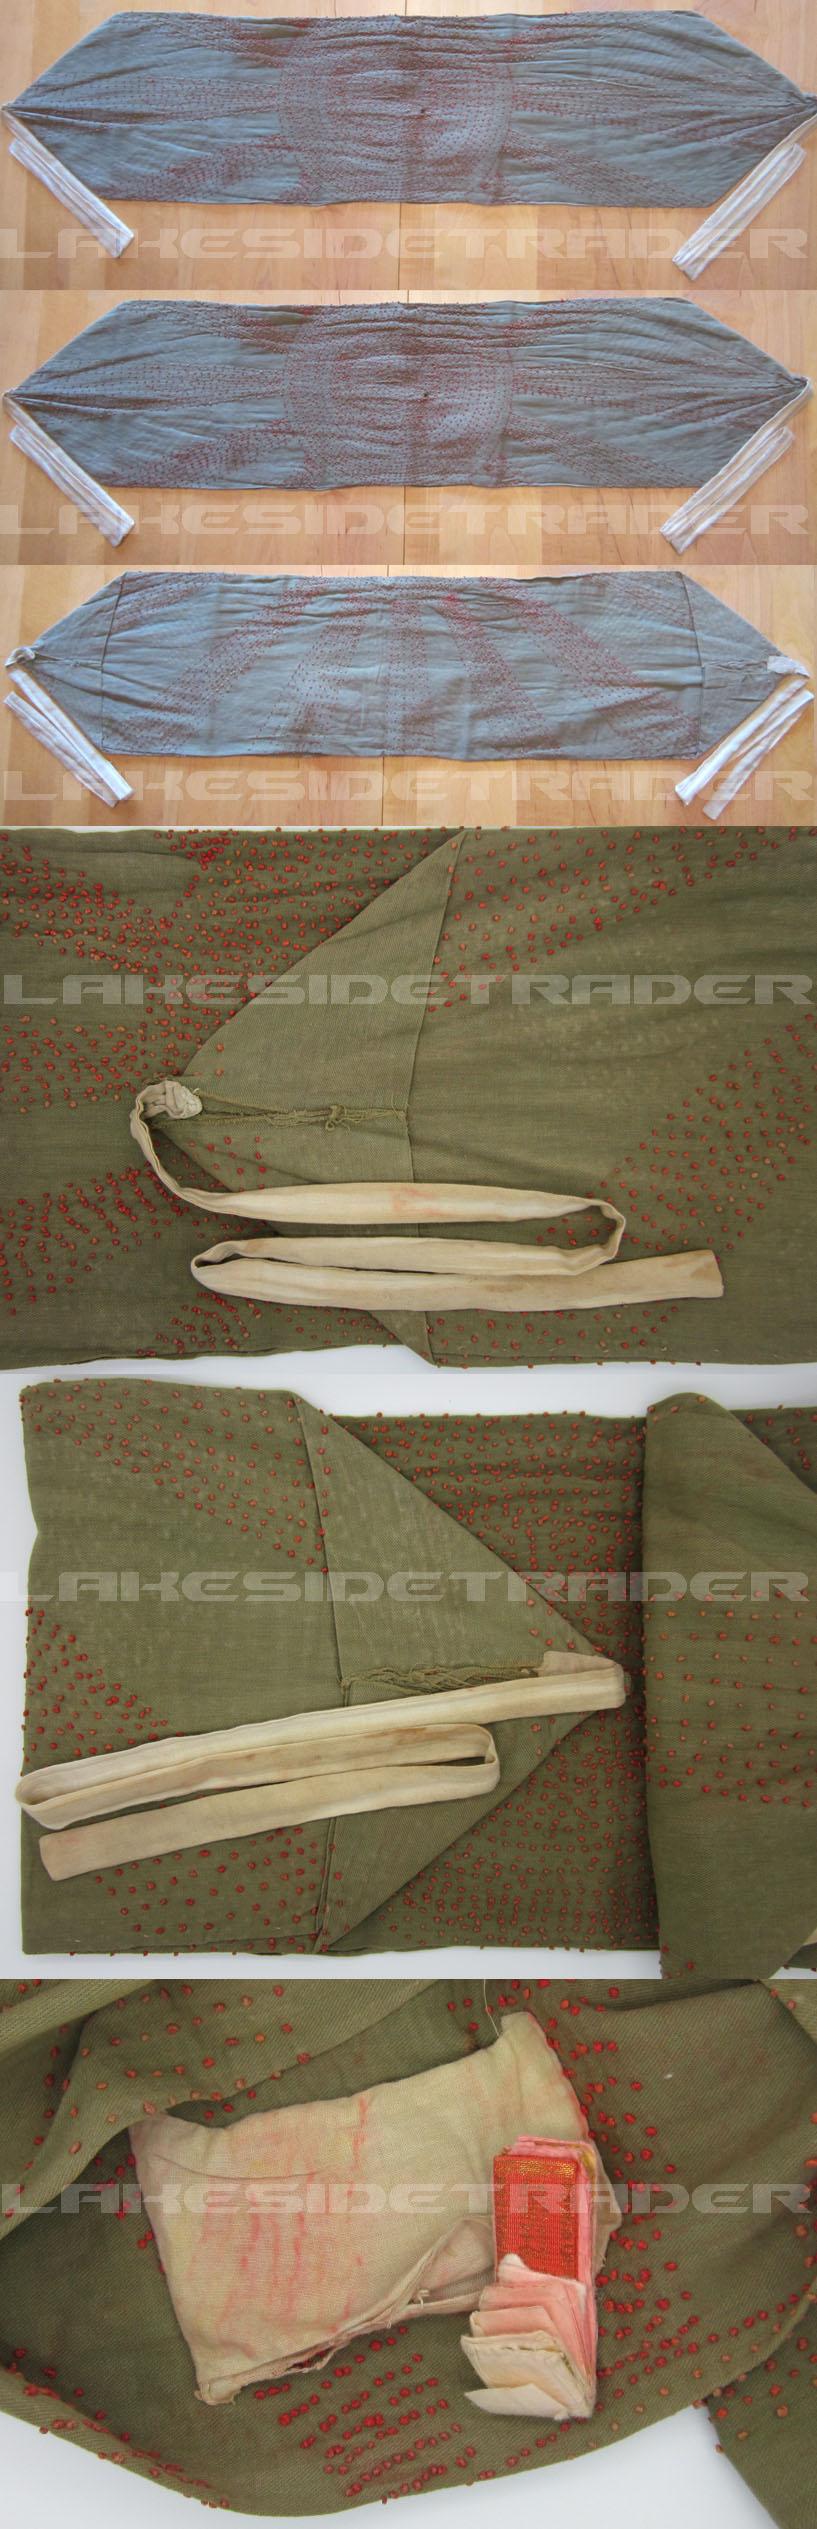 Japanese Green Senninari, (1000 Stitch Belt)